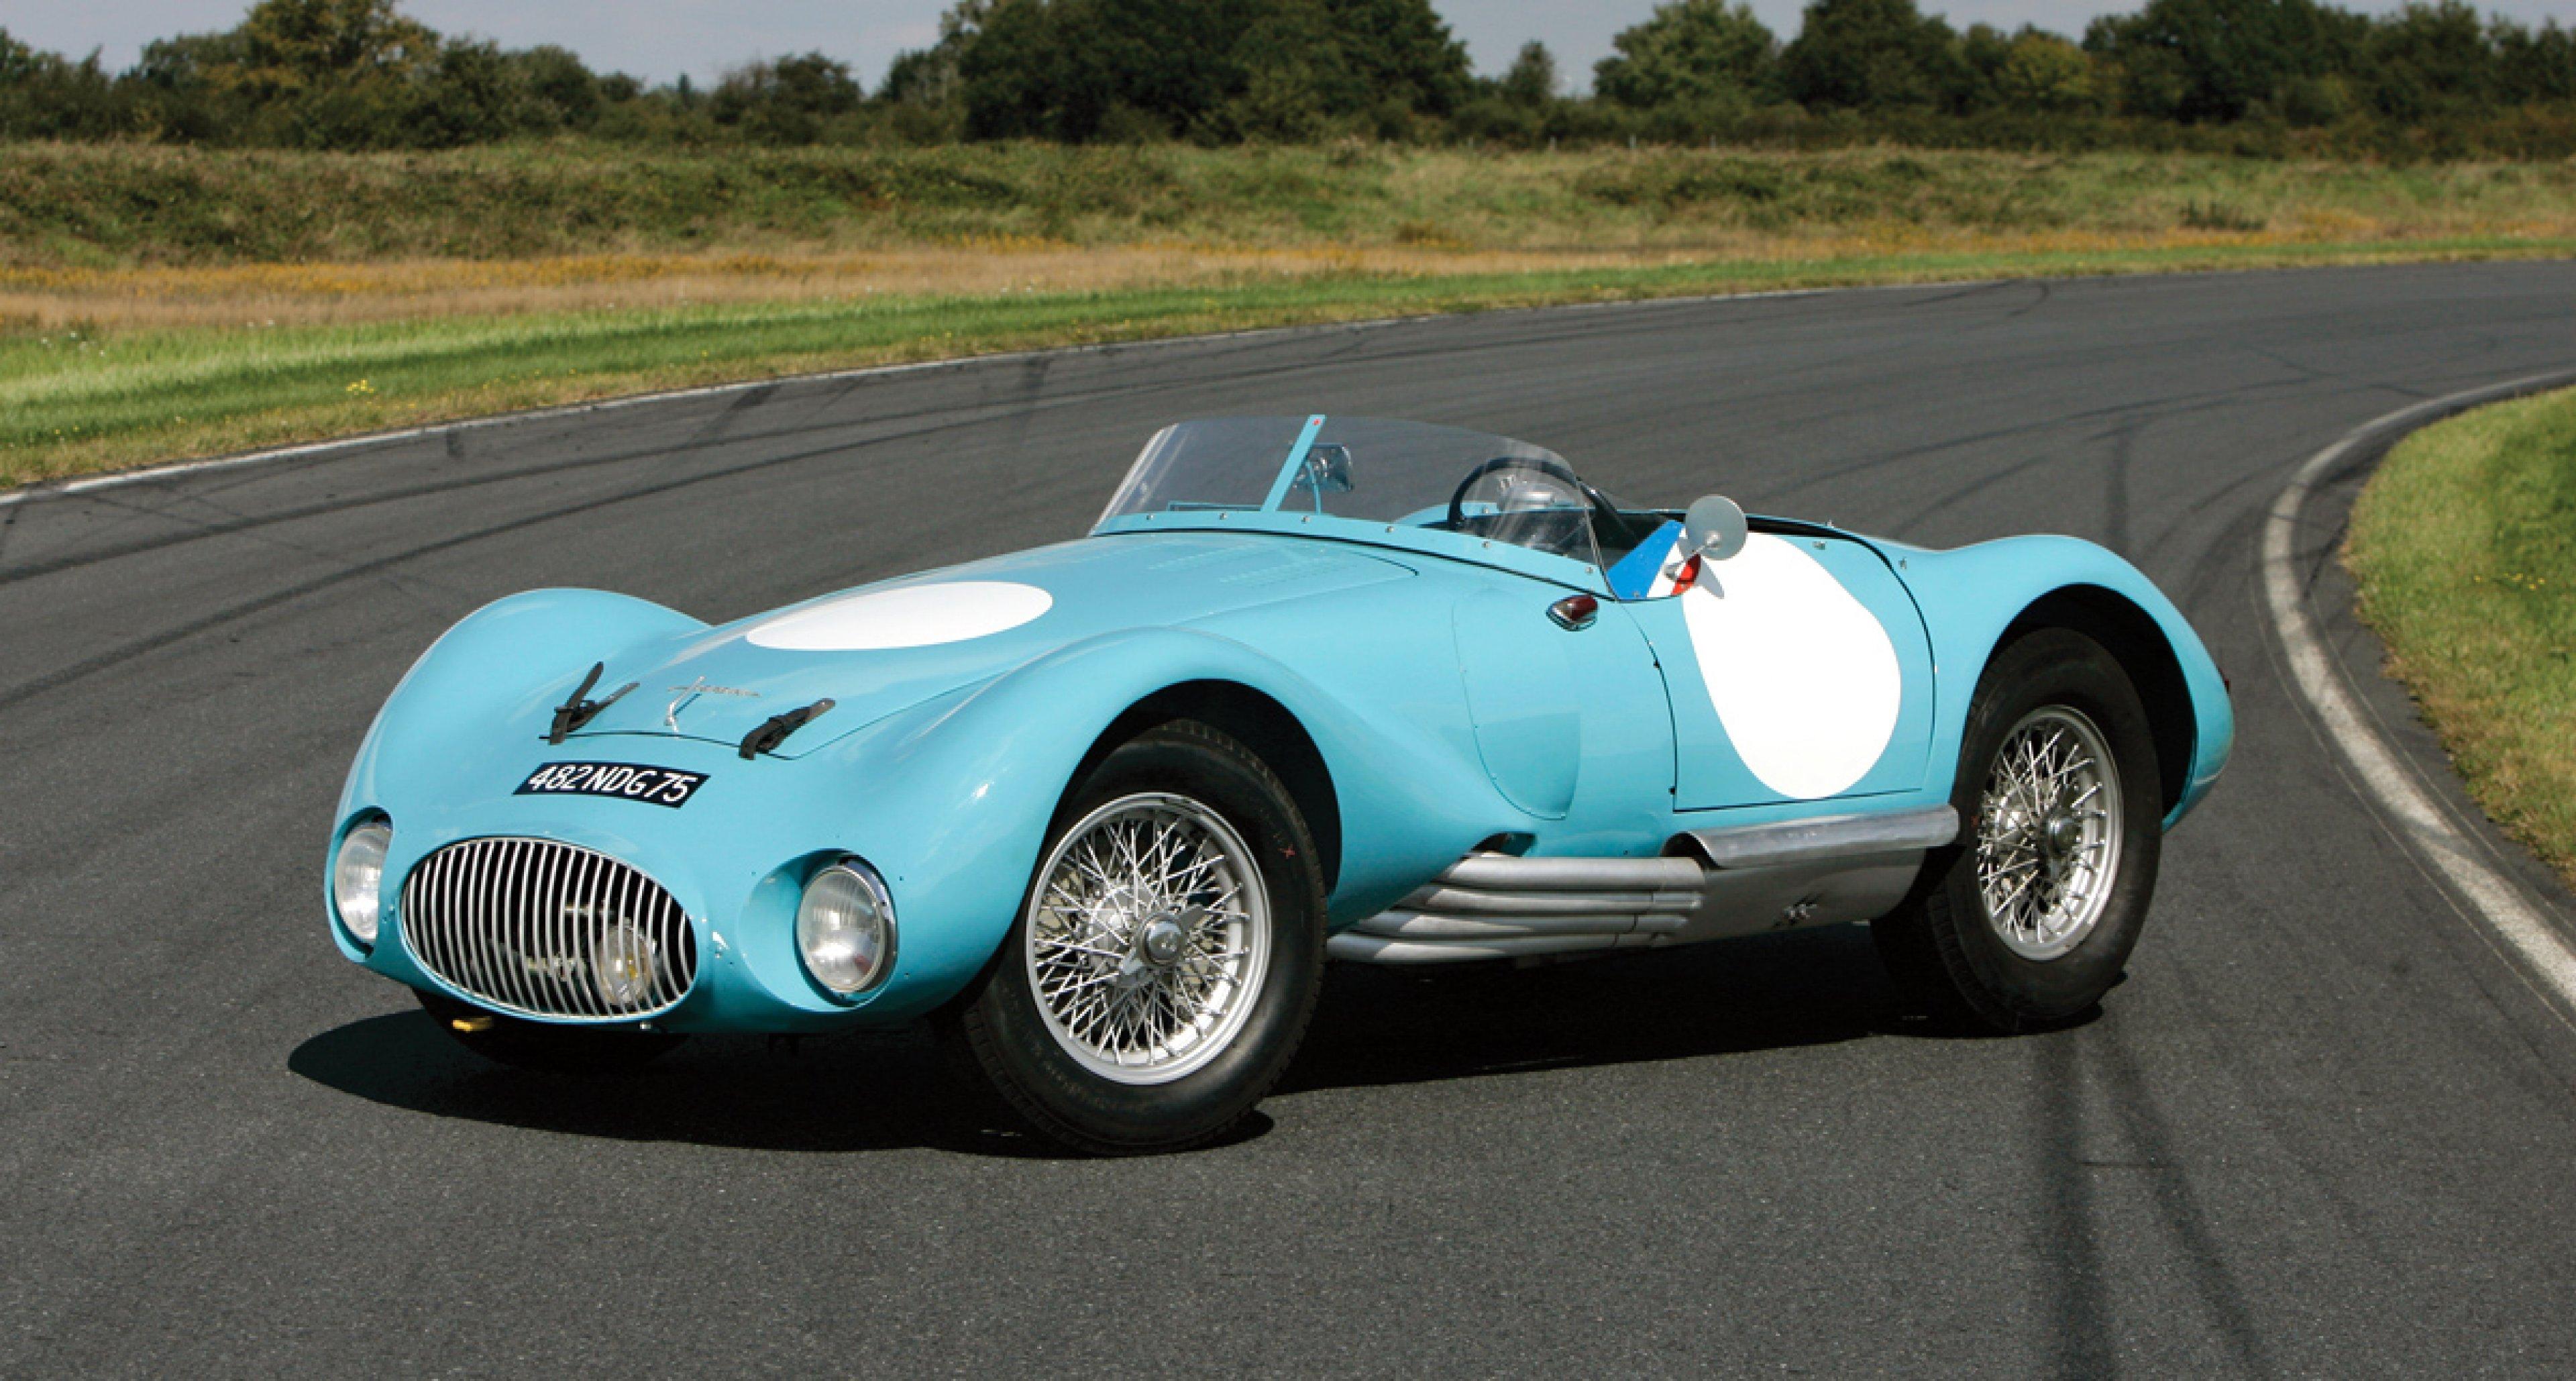 Lot 40: 1953 Gordini Type 24 S € 3.000.000 - 4.000.000